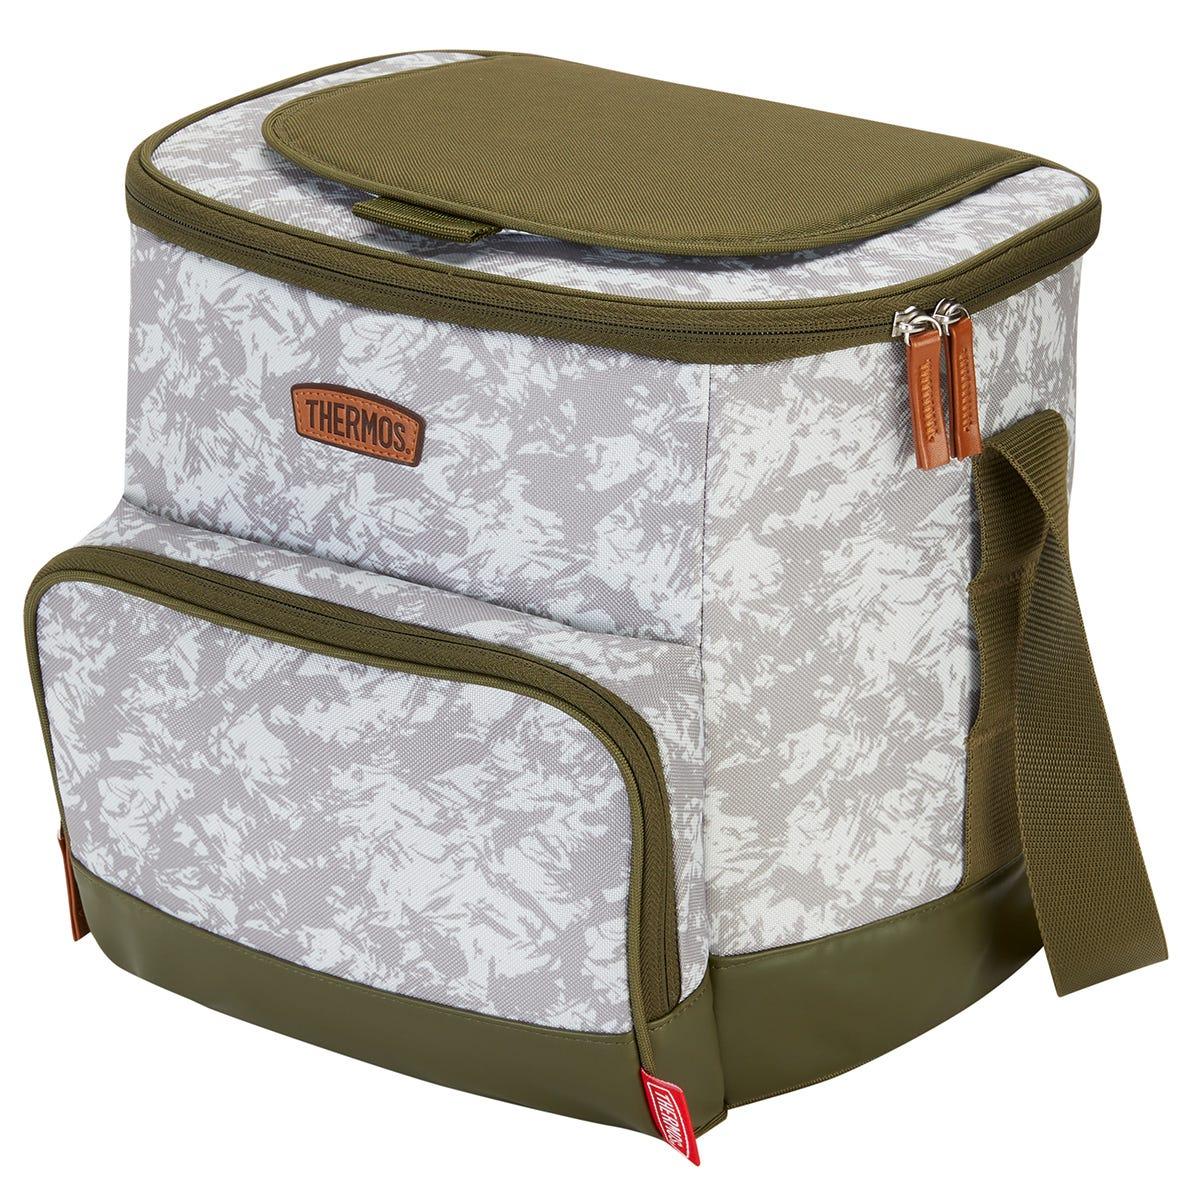 Thermos The Urban Cool Bag 12L - Green/Grey Camo